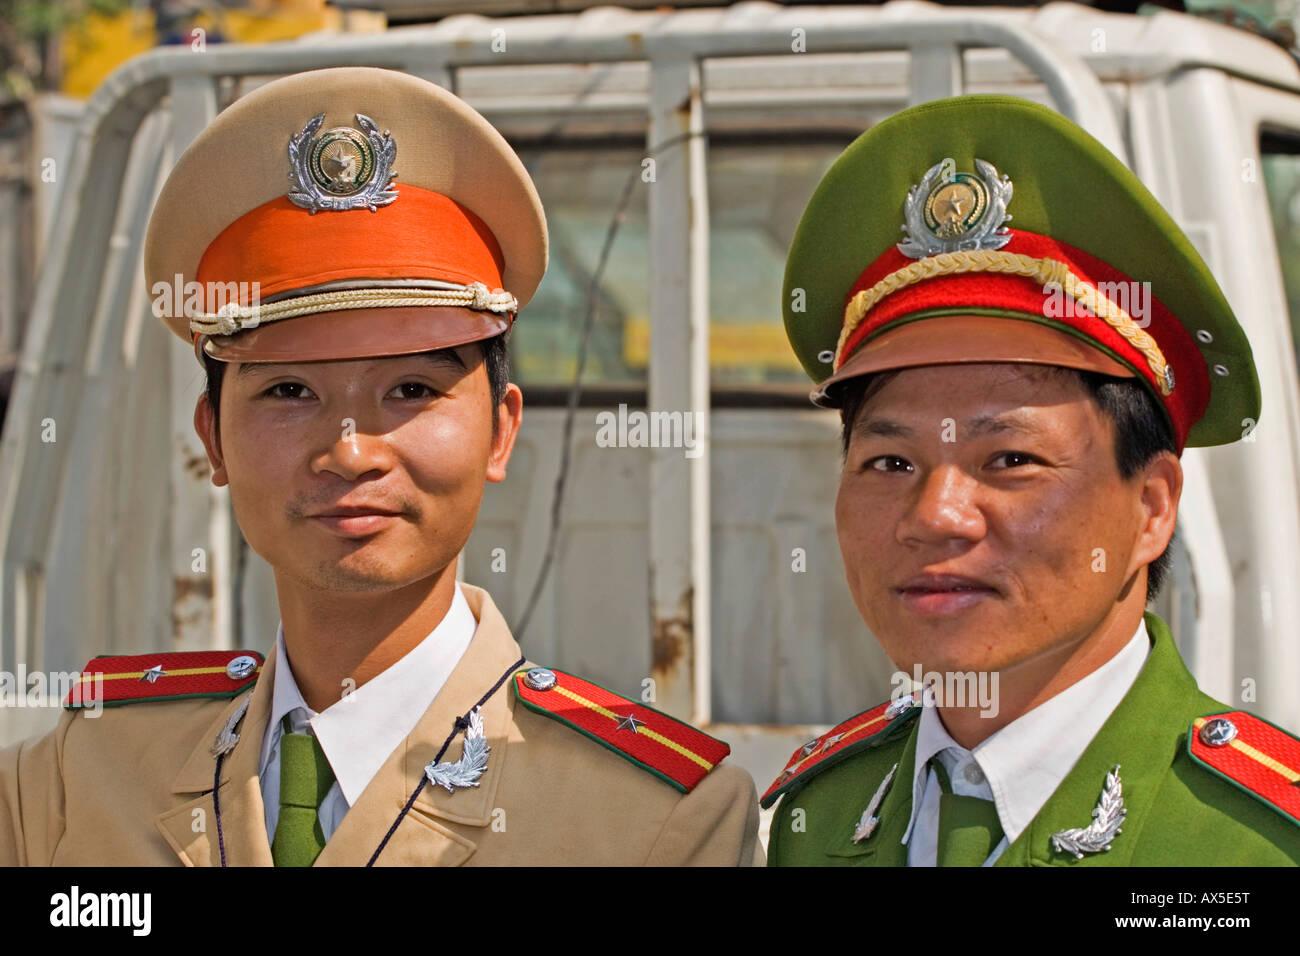 Two policemen in Hanoi, Vietnam - Stock Image